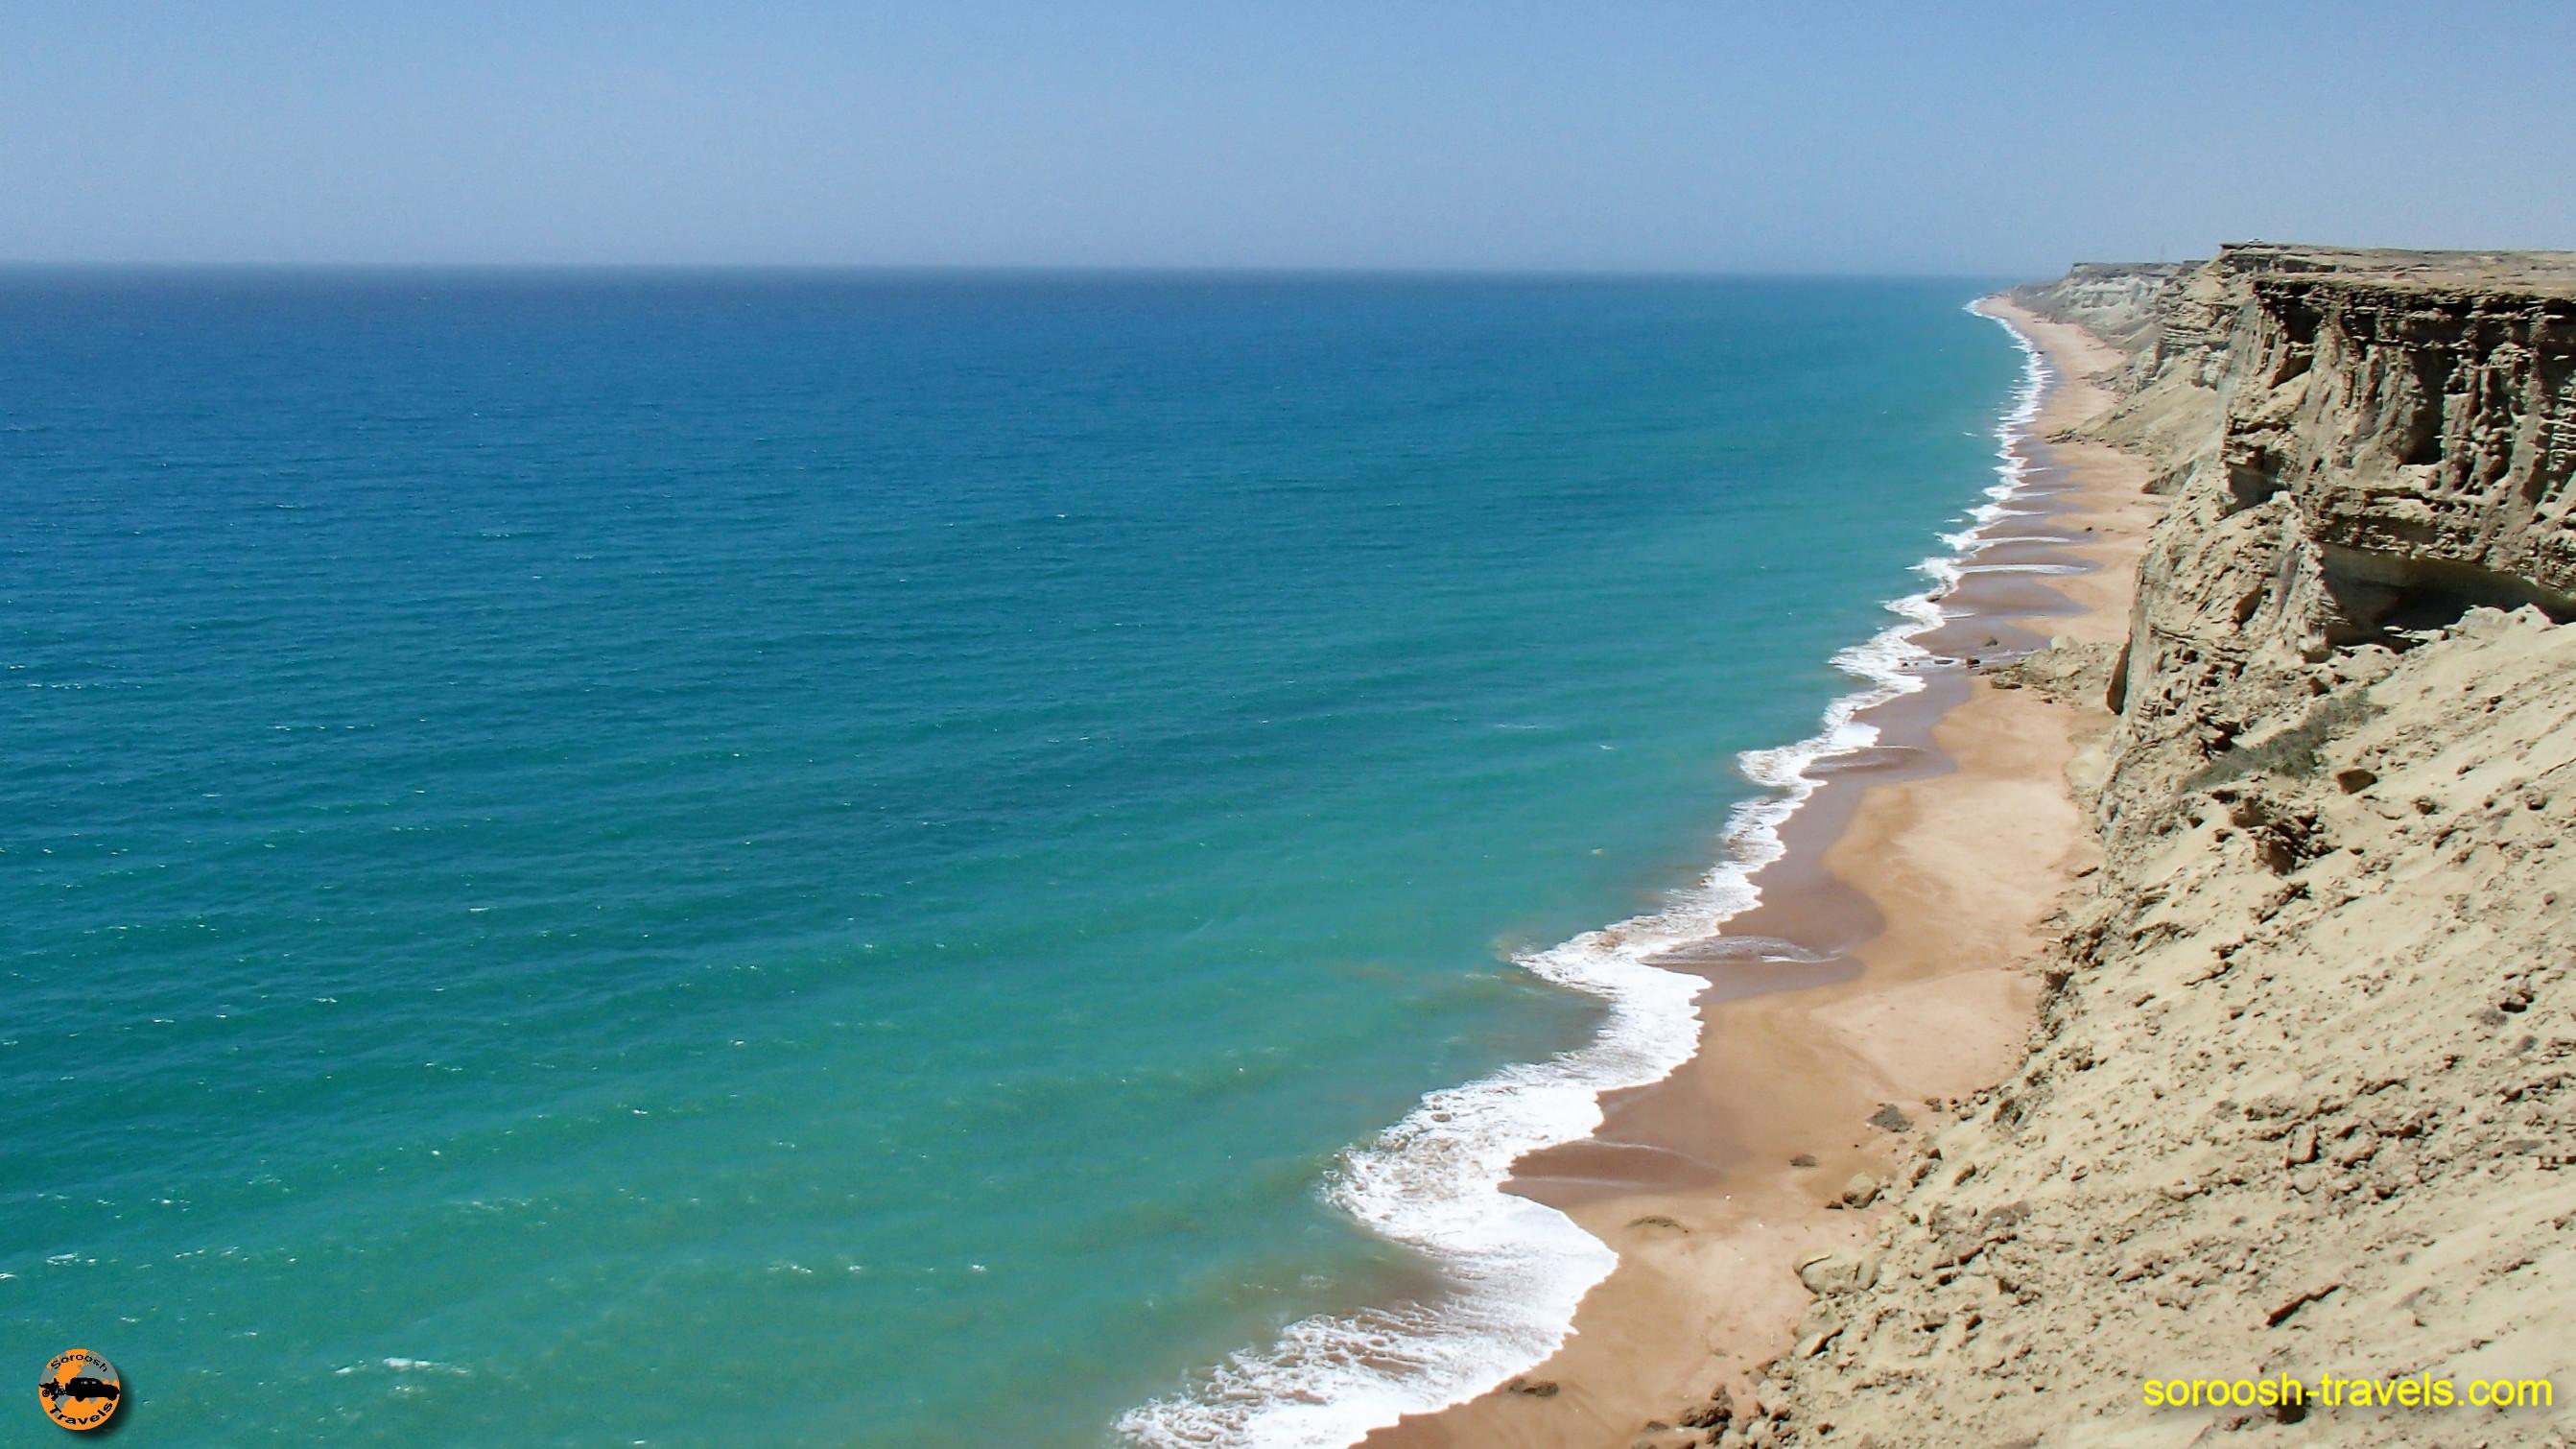 سواحل اطراف چابهار - نوروز ۱۳۹۶